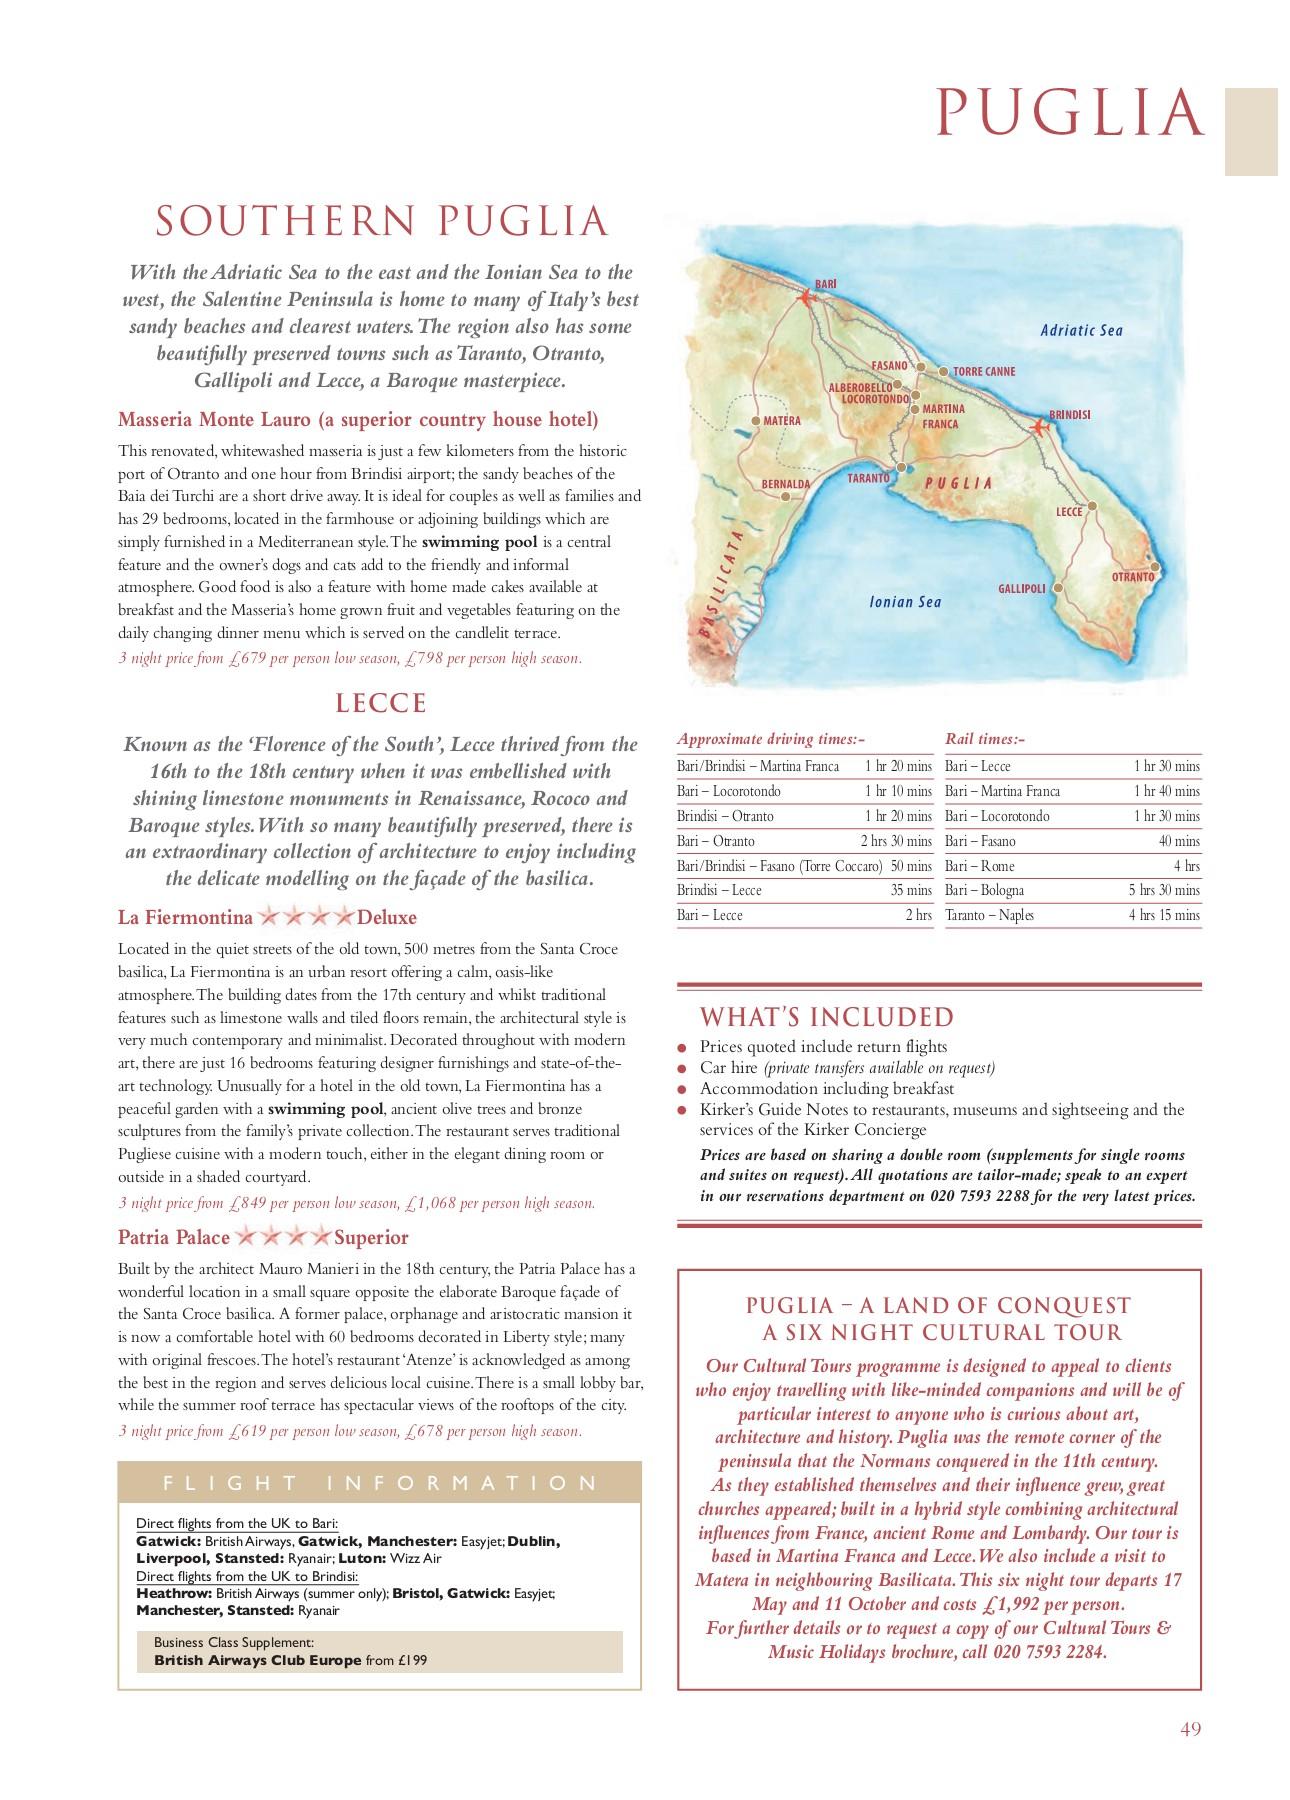 Ristorante Martina Rosa Ischia 2163_italy 2019-20_web-flip book pages 51-68 | pubhtml5